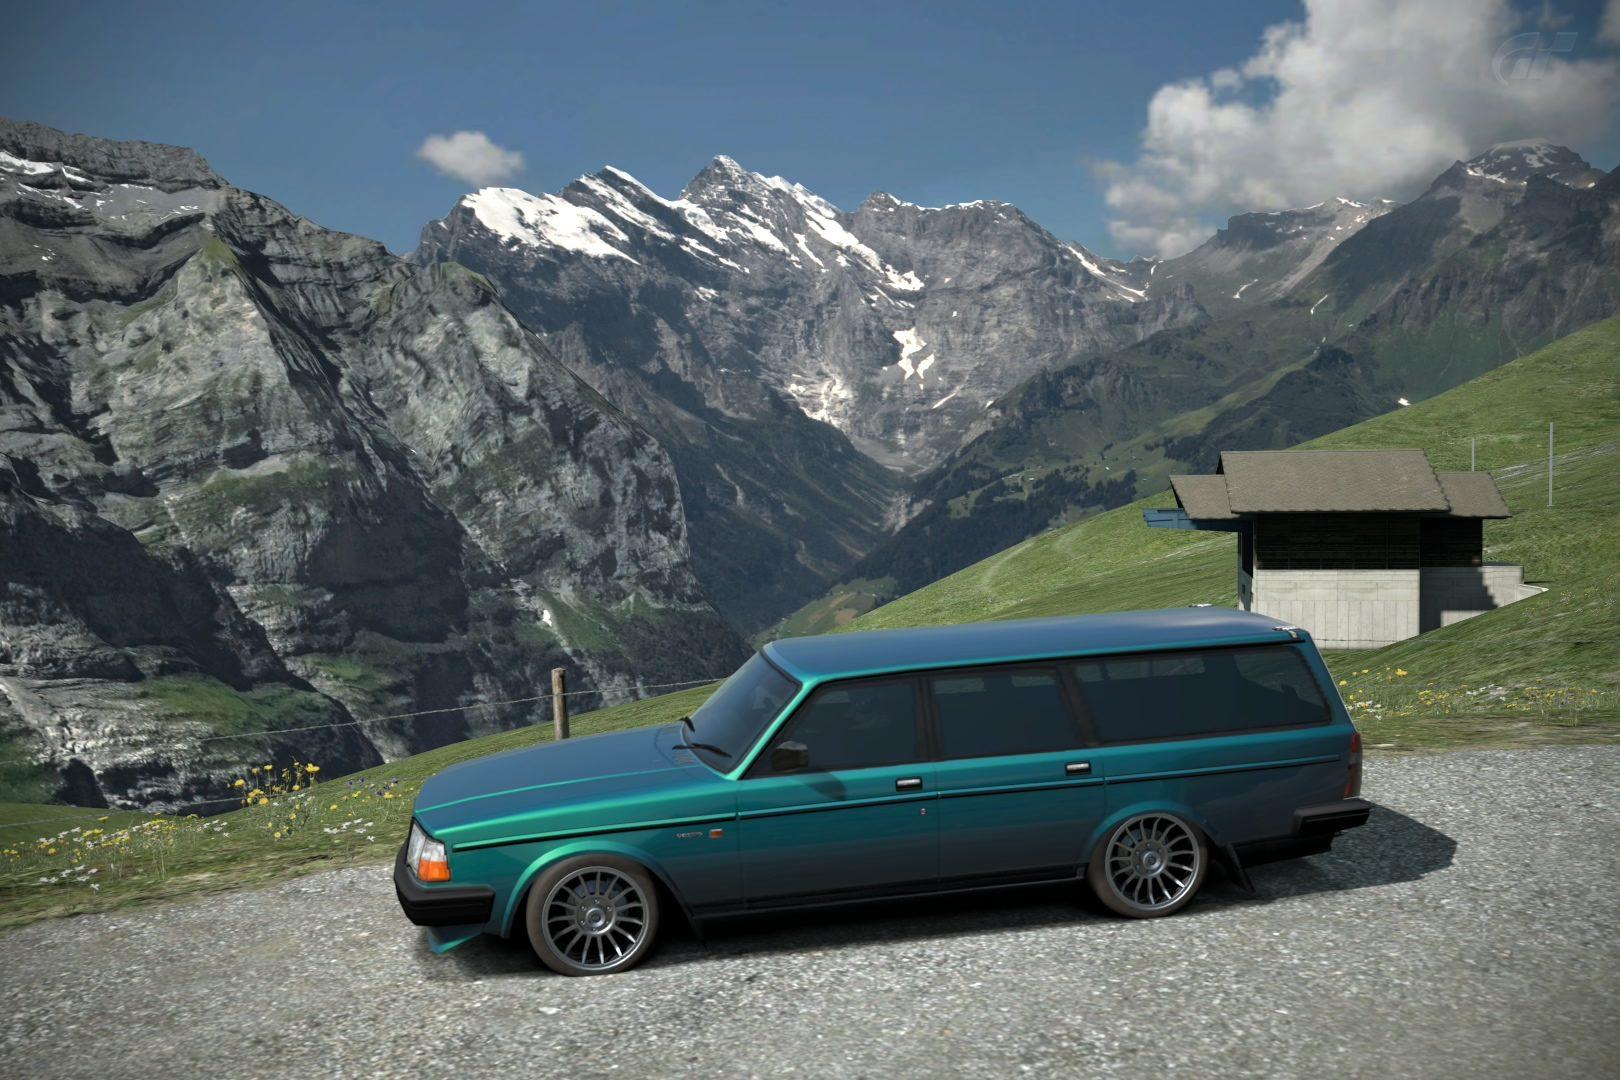 Eiger Nordwand - Short Track_4.jpg